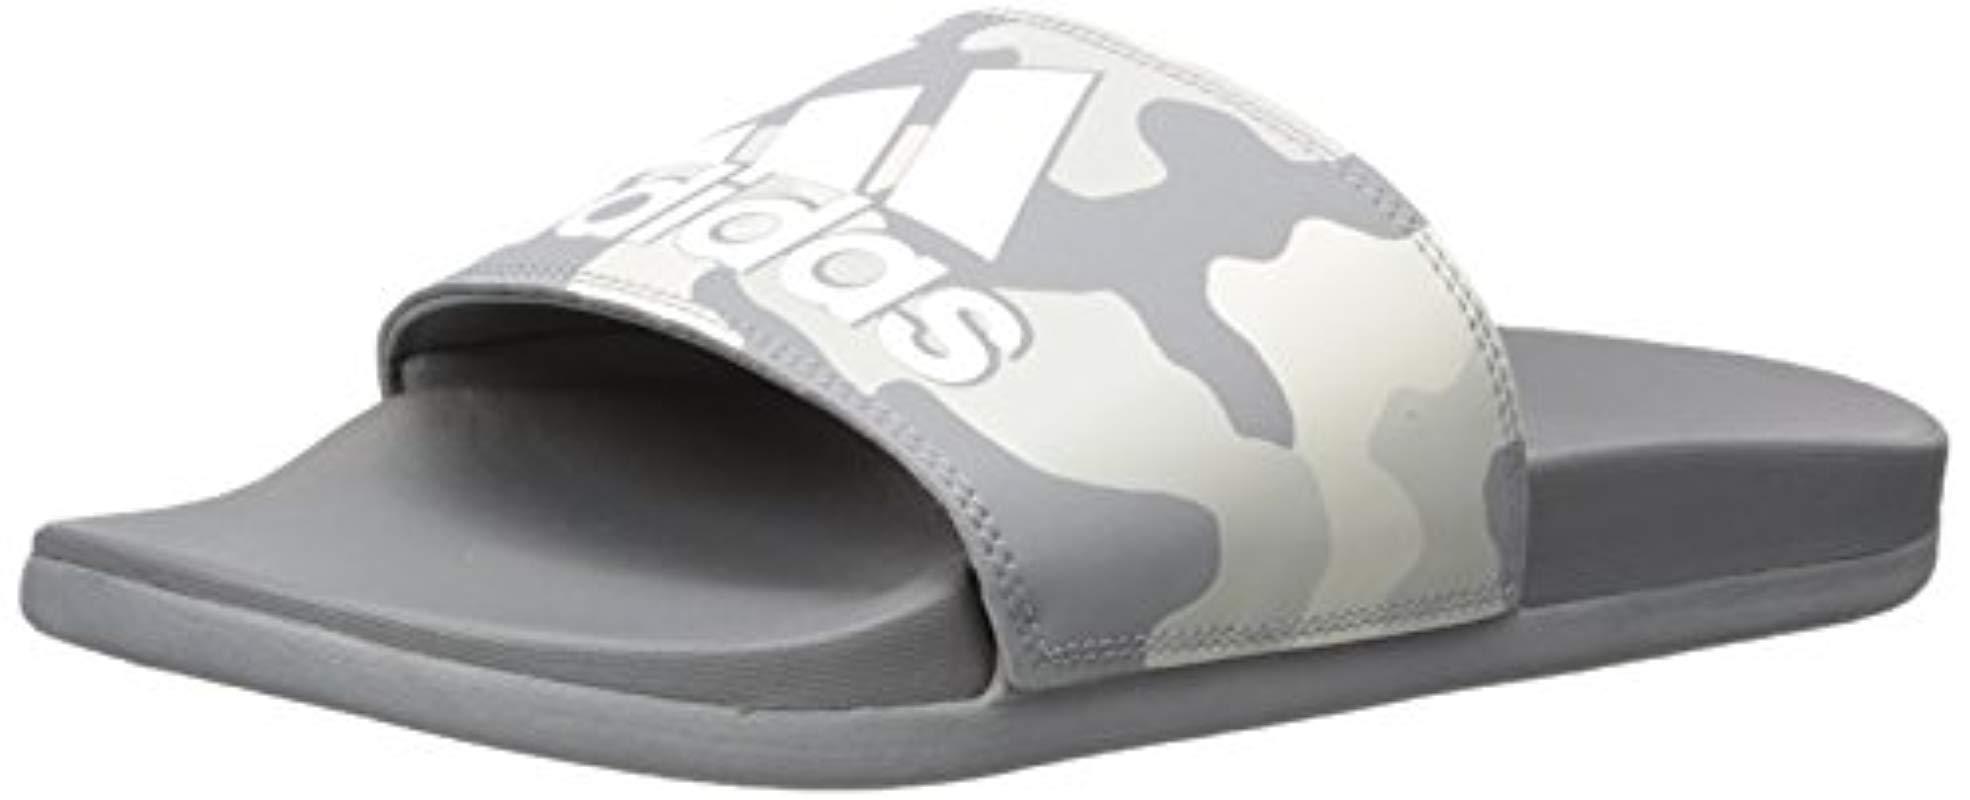 460dcf51b8d6 Lyst - adidas Originals Adidas Adilette Comfort Slide Sandal in Gray ...